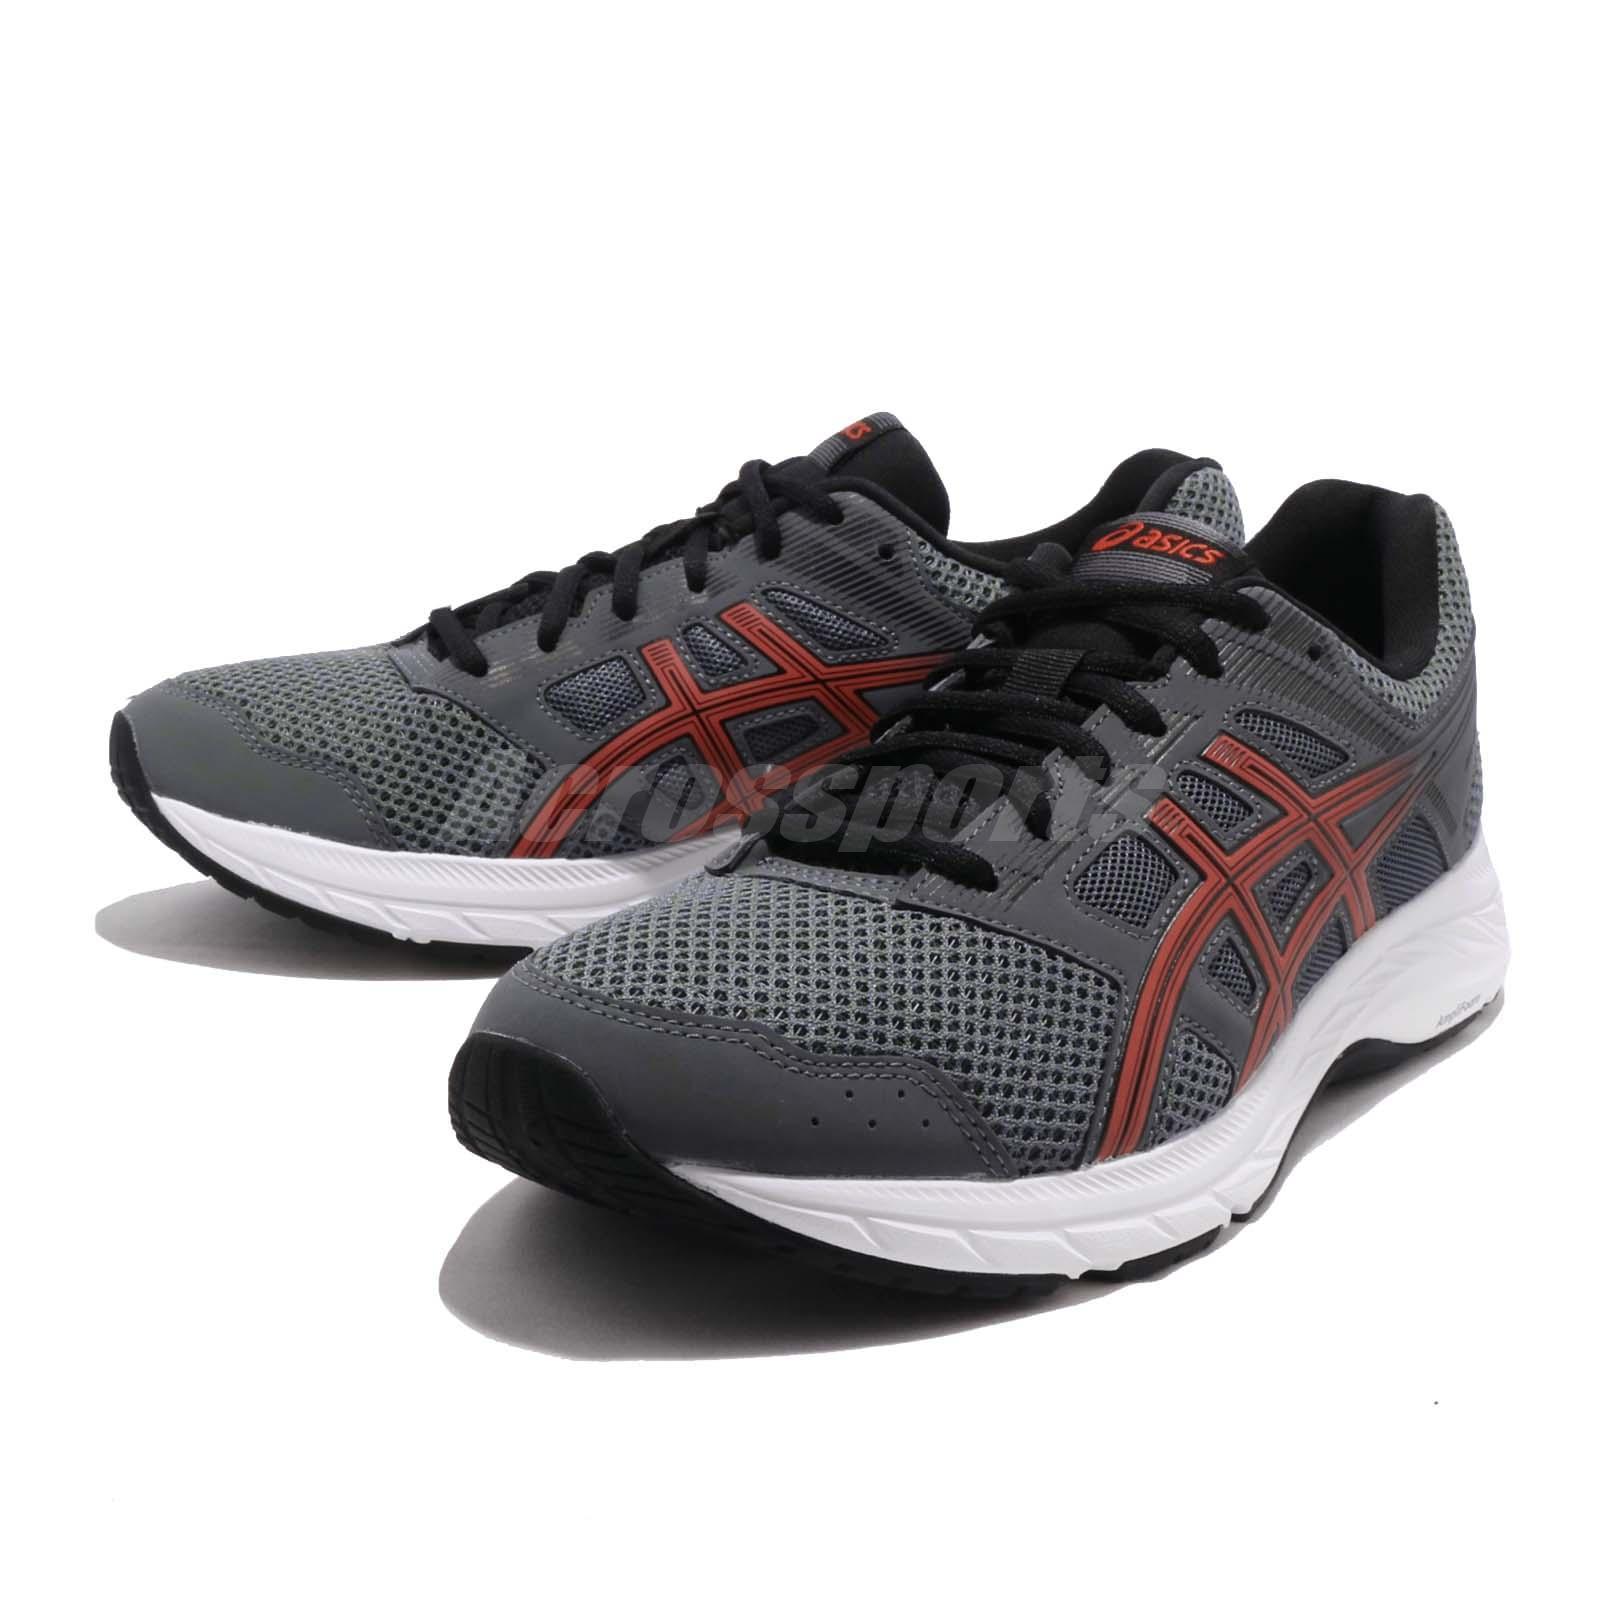 4964c02111e9 Details about Asics Gel Contend 5 Steel Grey Red Snapper Men Running Shoe  Sneaker 1011A256-021